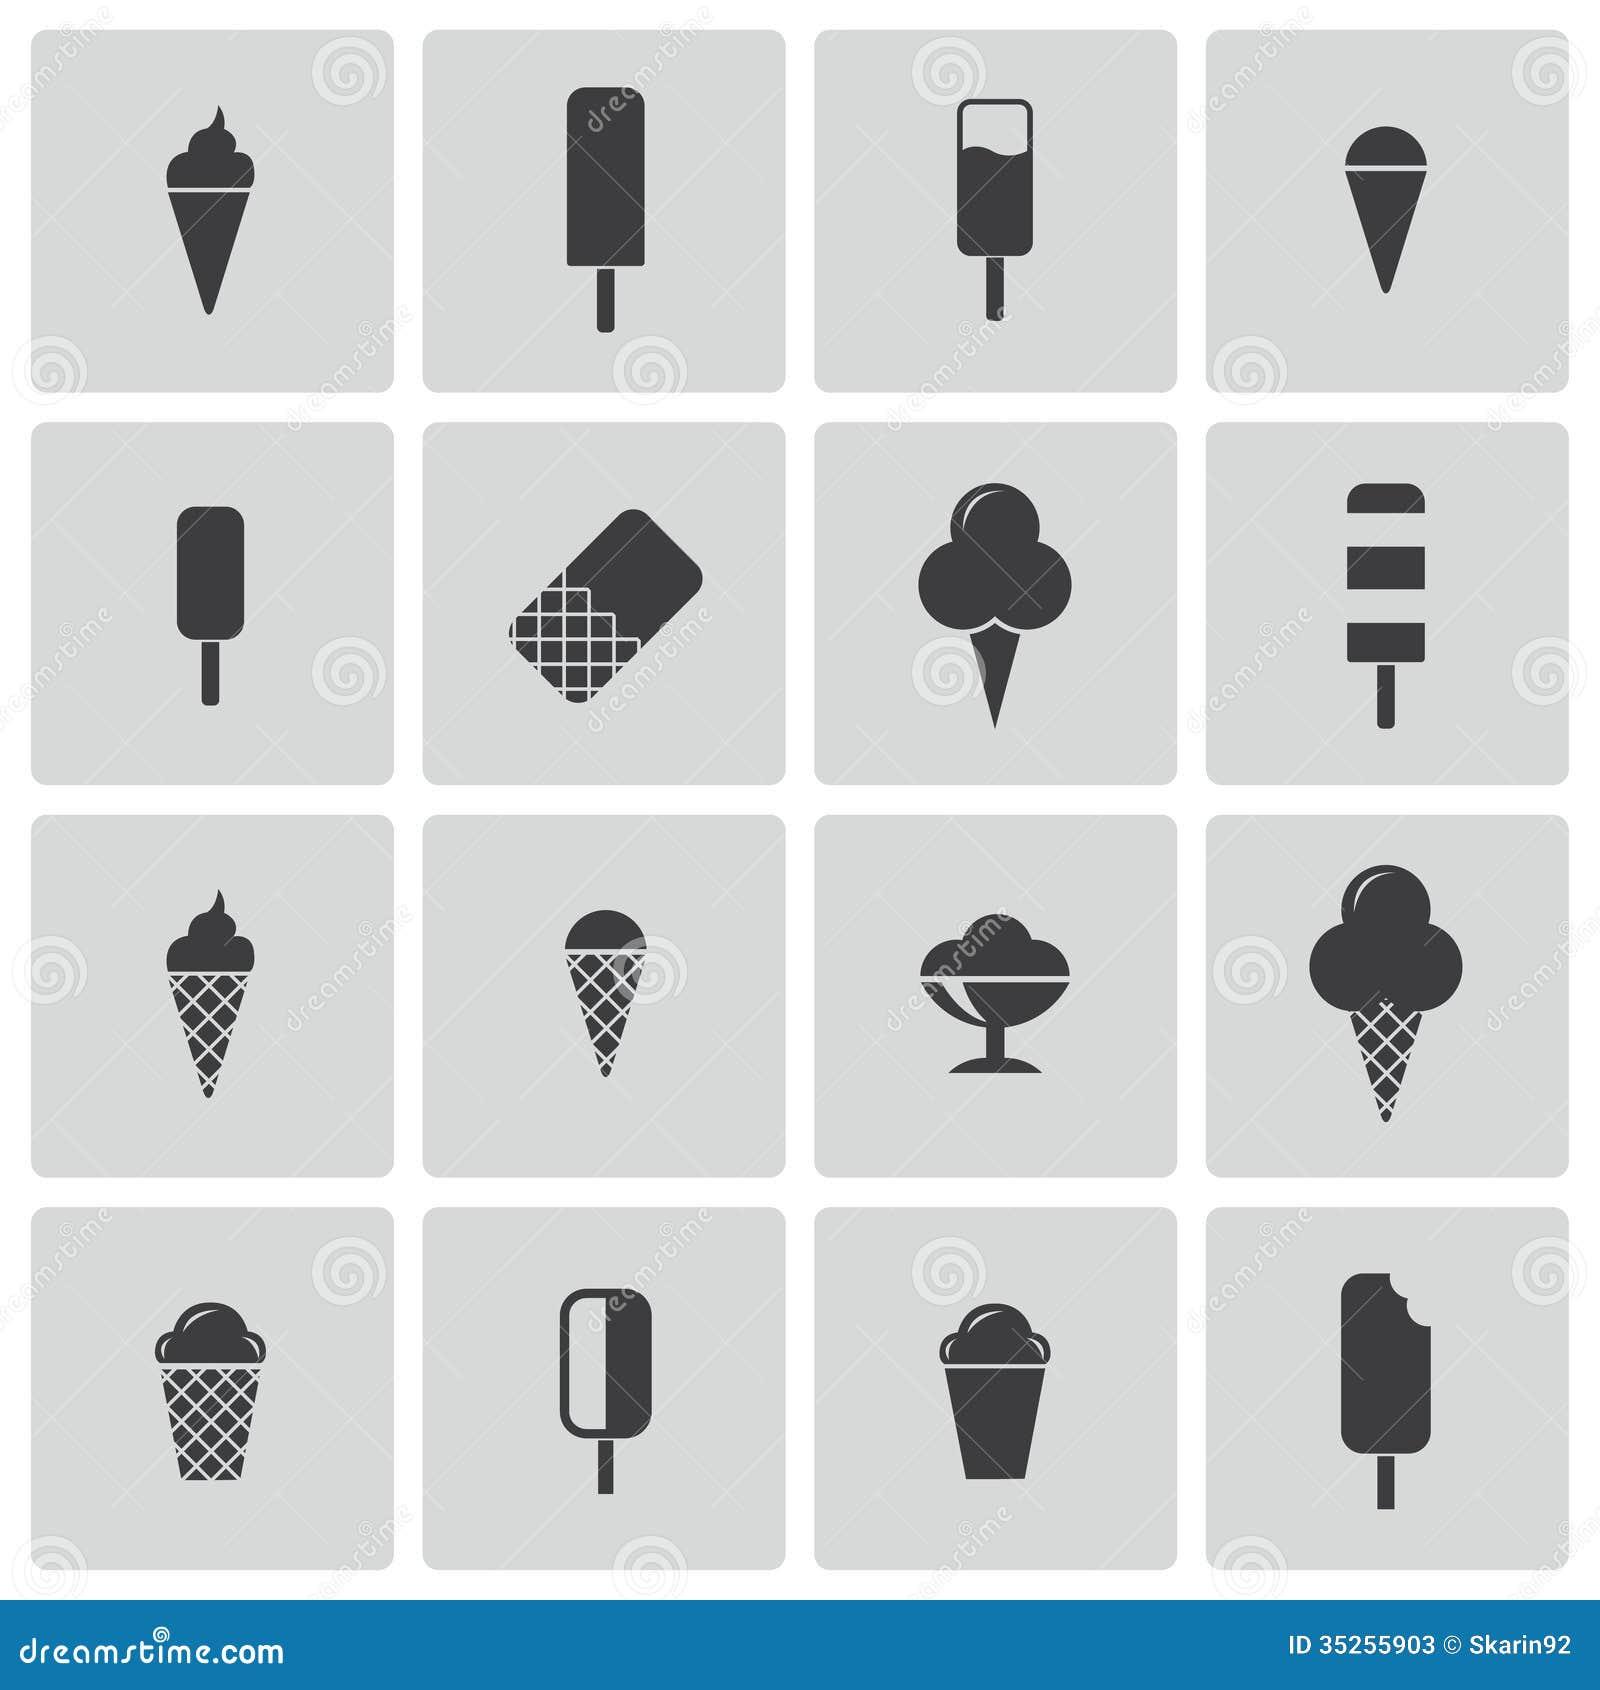 Fresh Ice Cream Stick In Summer Wallpaper Vector: Vector Black Ice Cream Icons Set Stock Photos